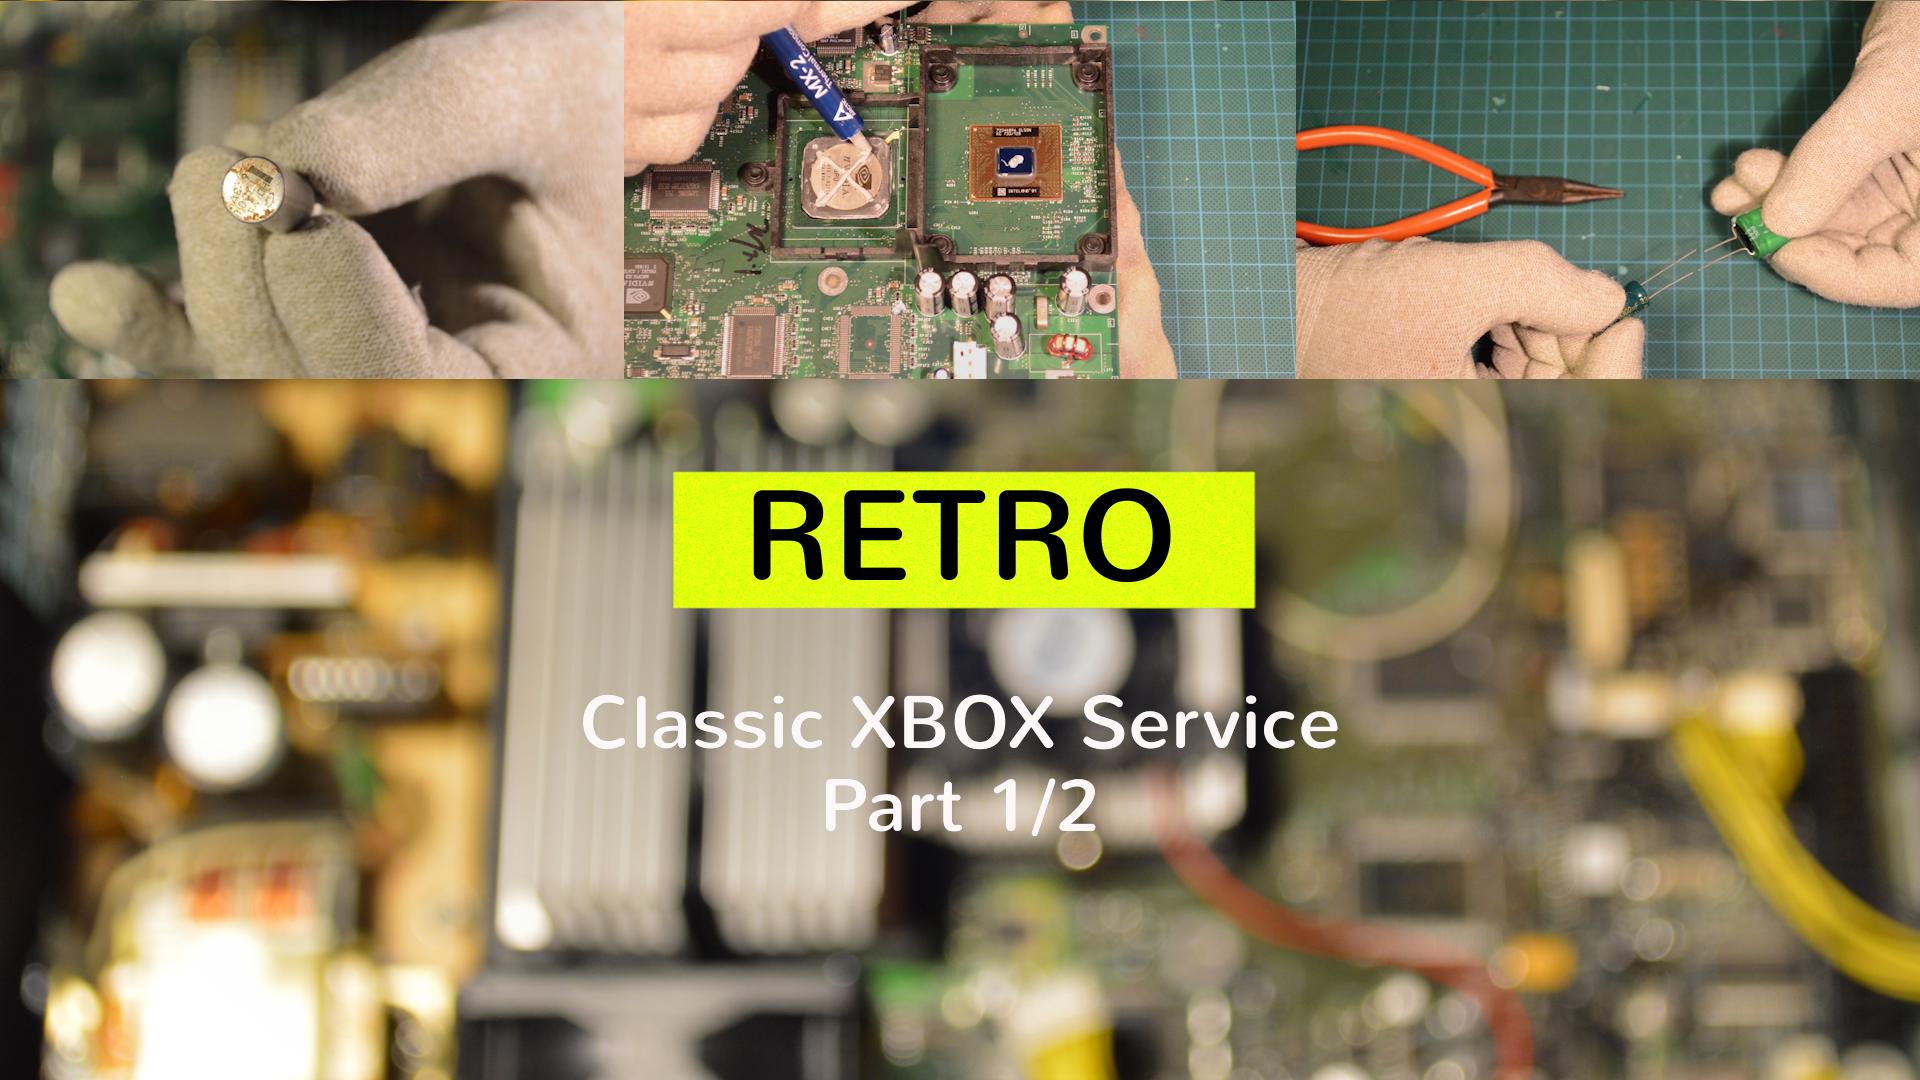 Classic XBOX Service: Part 1/2